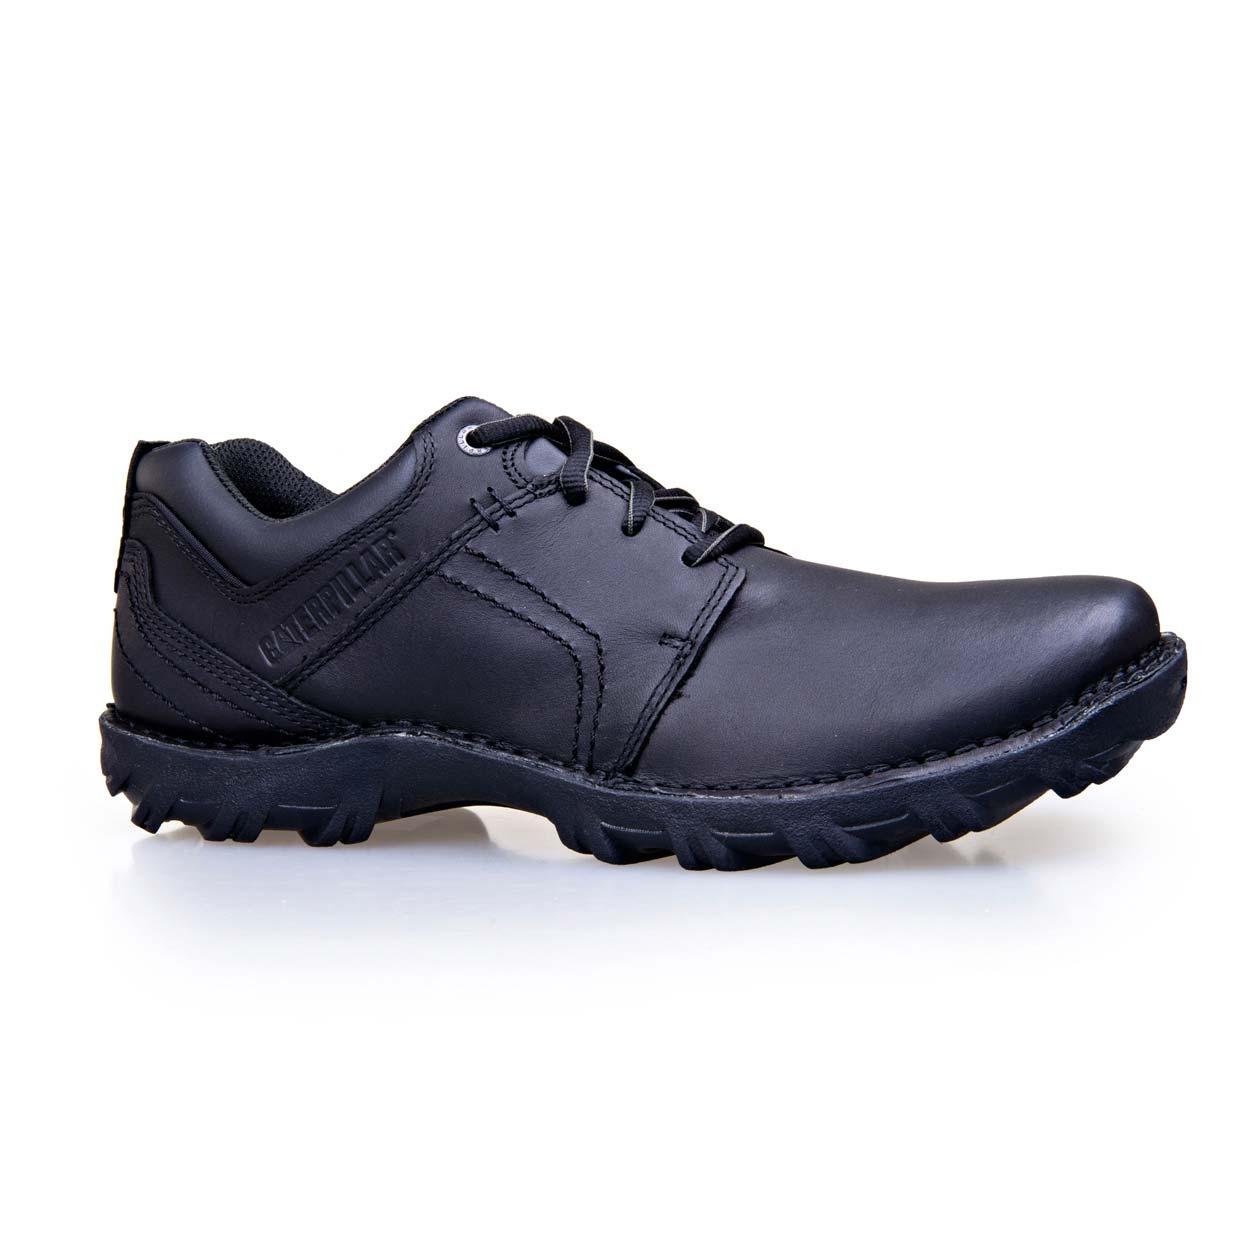 Cat Footwear Australia